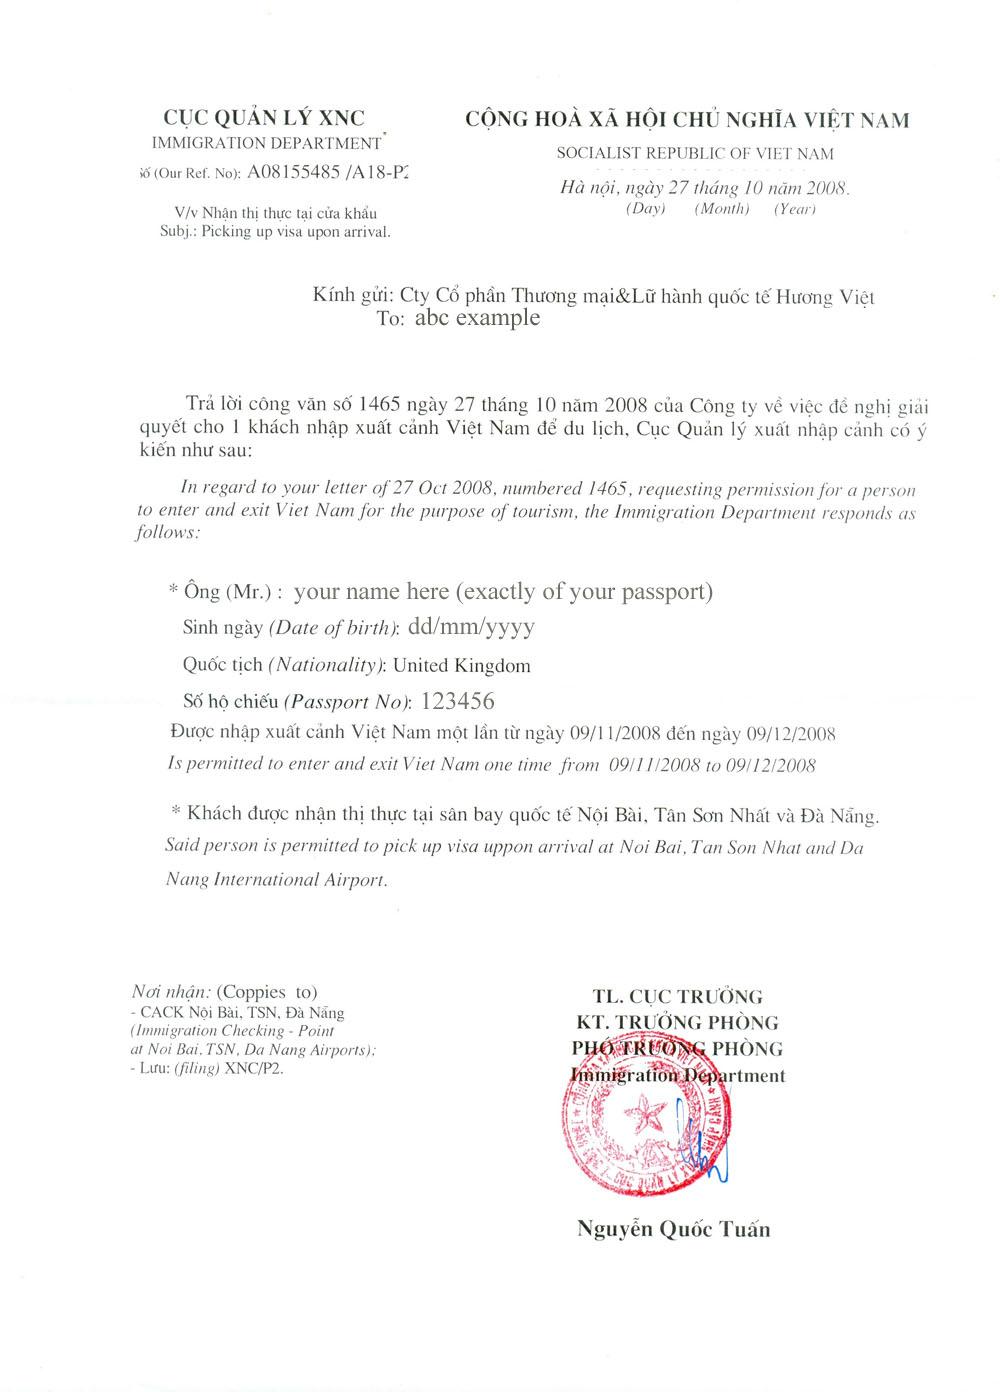 Vietnam Visa Arrival Form Download